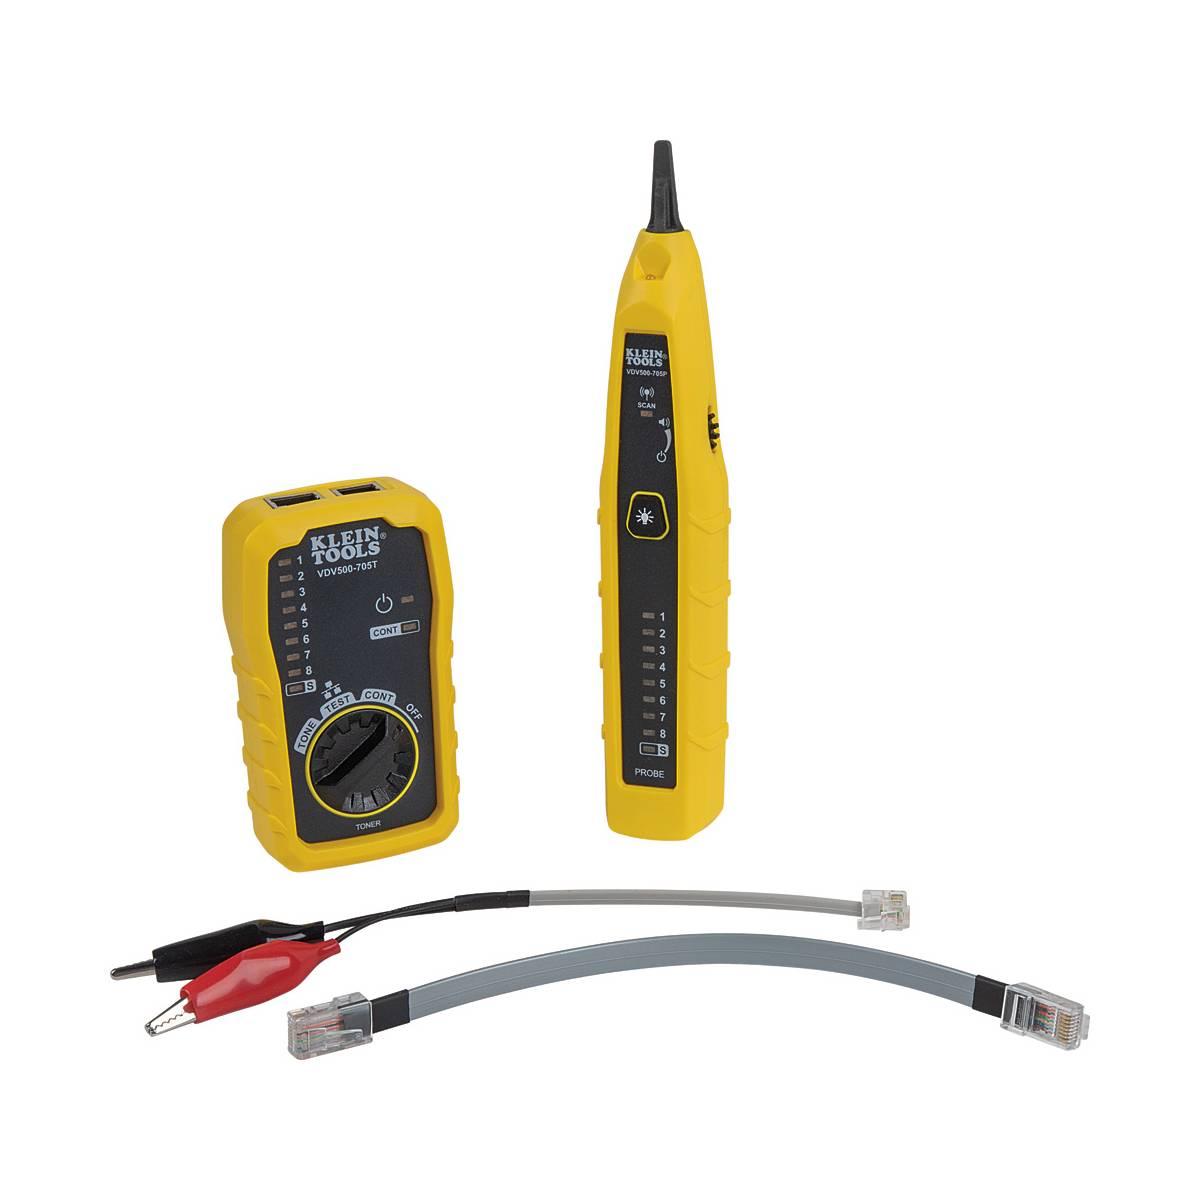 Kit Prueba Cable RJ45 Ruido Voz Datos VDV500-705 Klein Tools